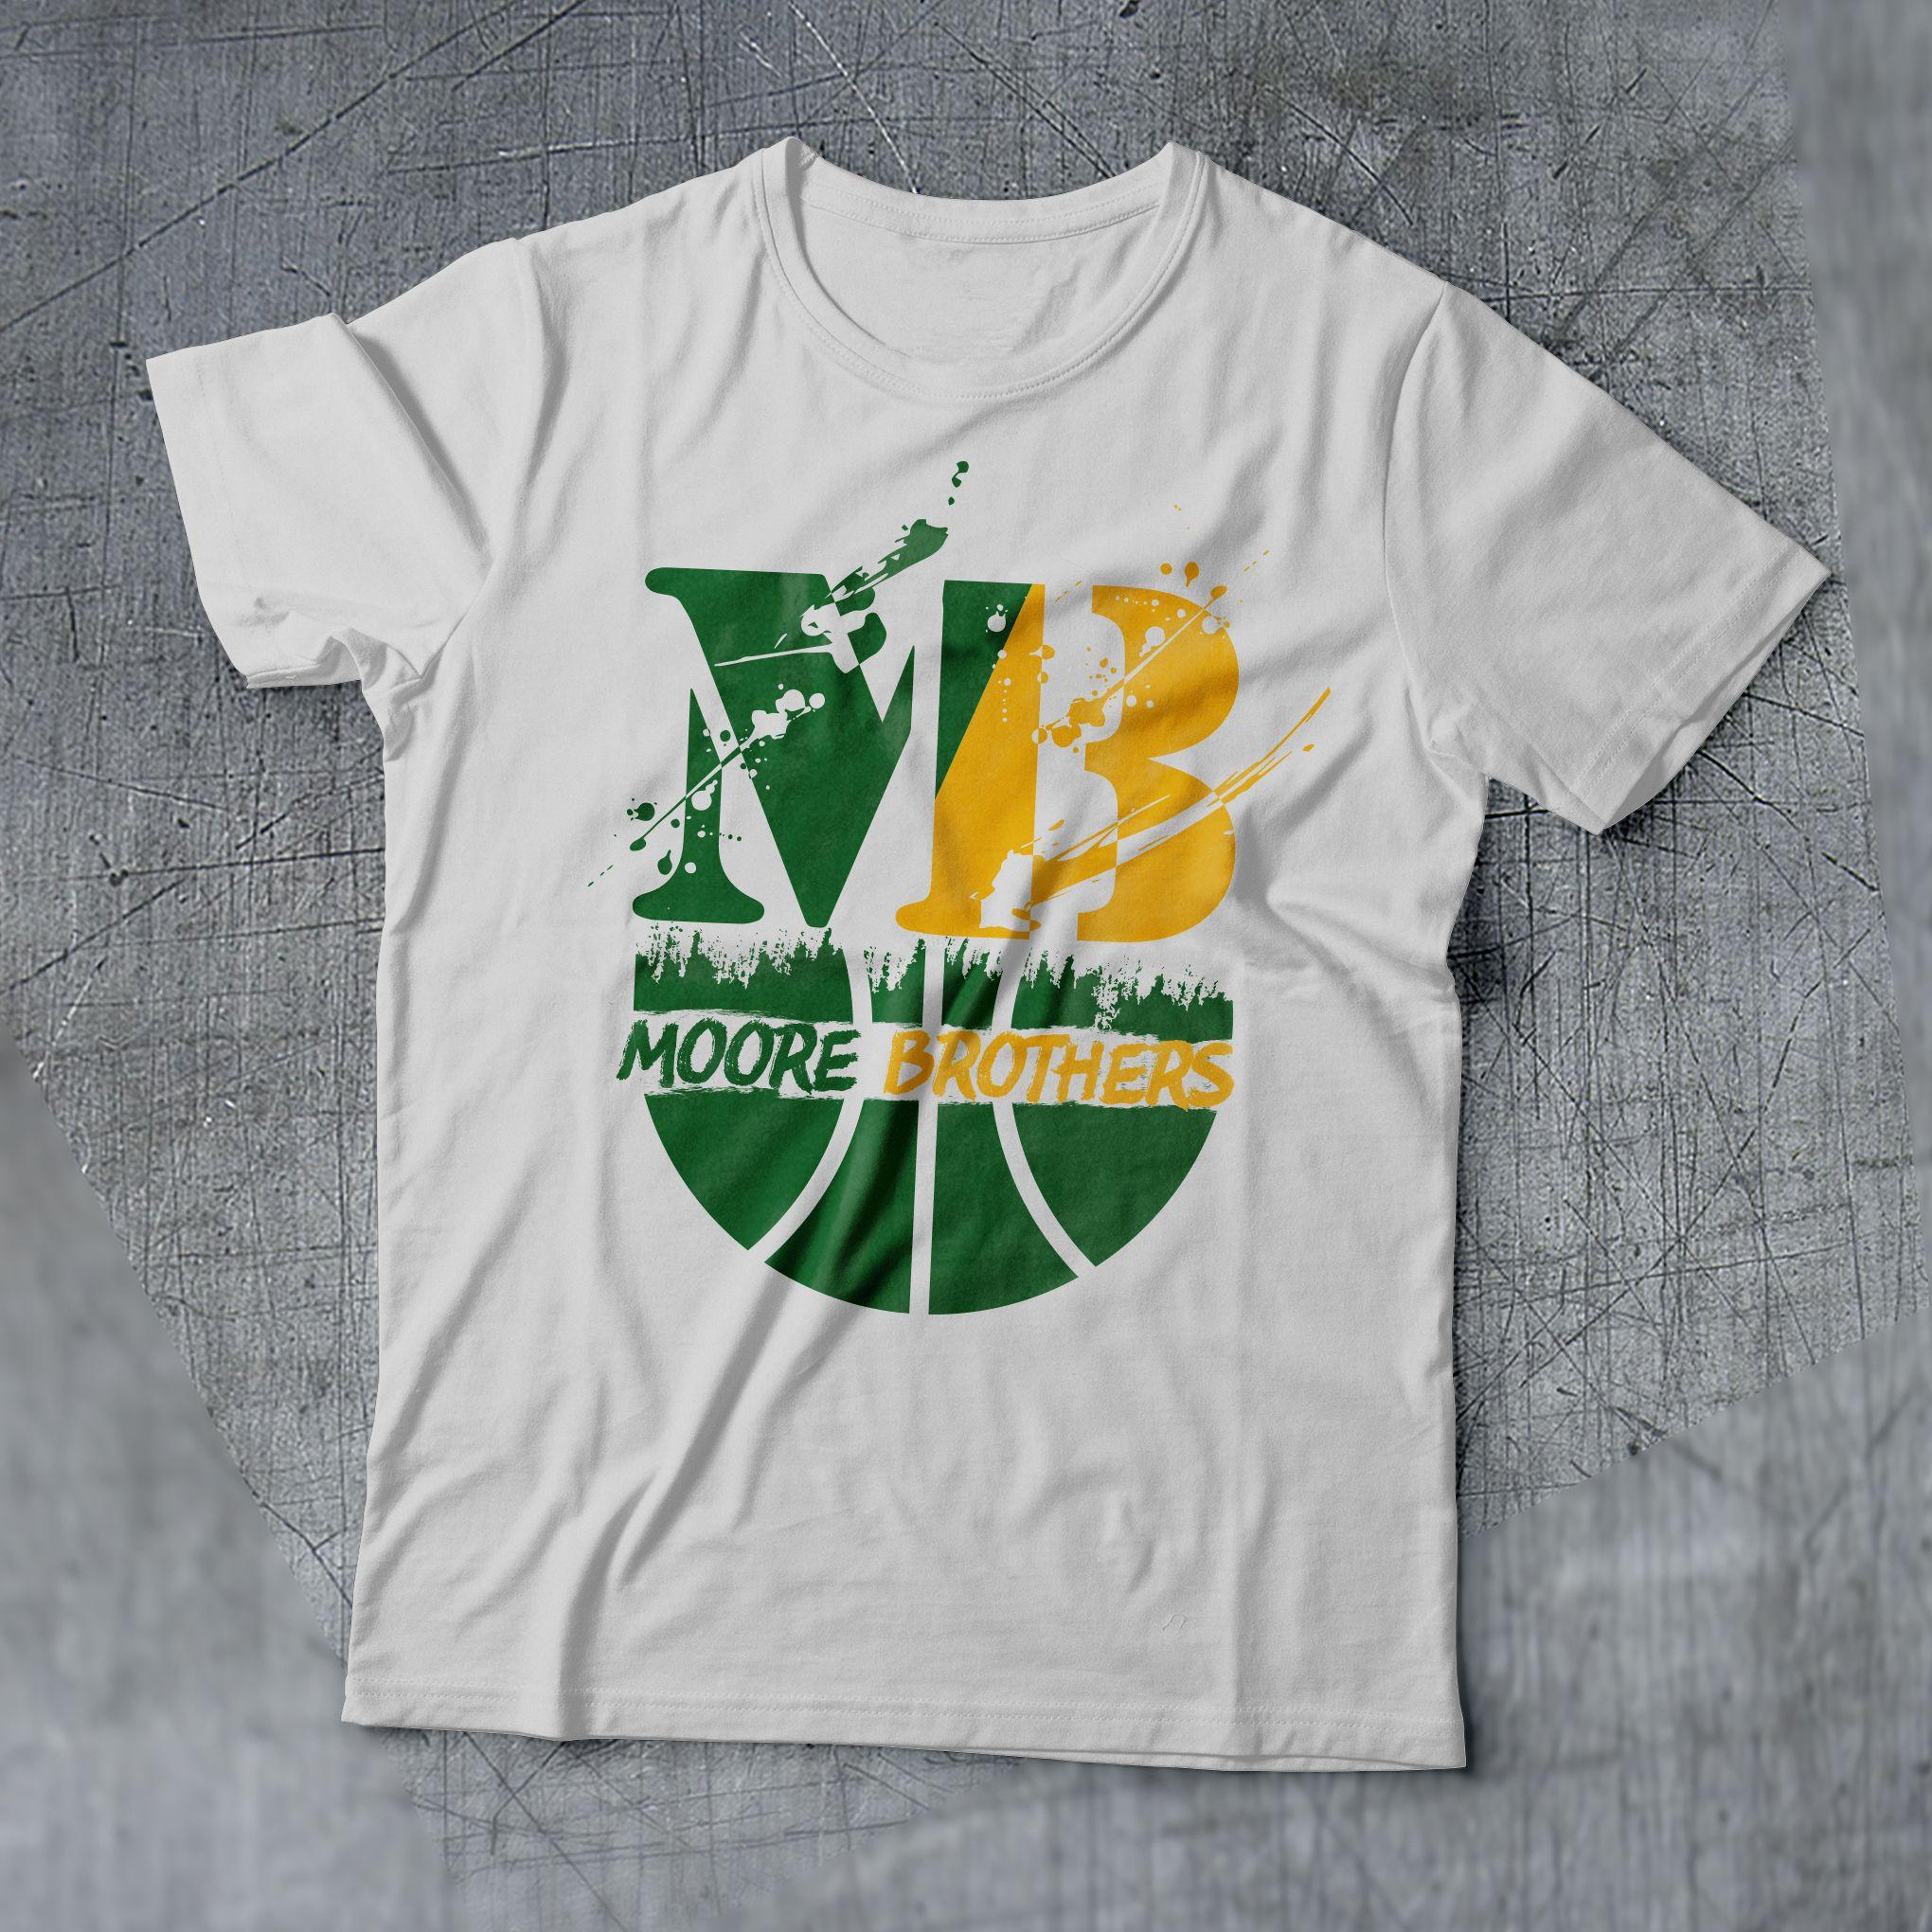 Shirt design pinterest - Moore Brothers Shirt Design